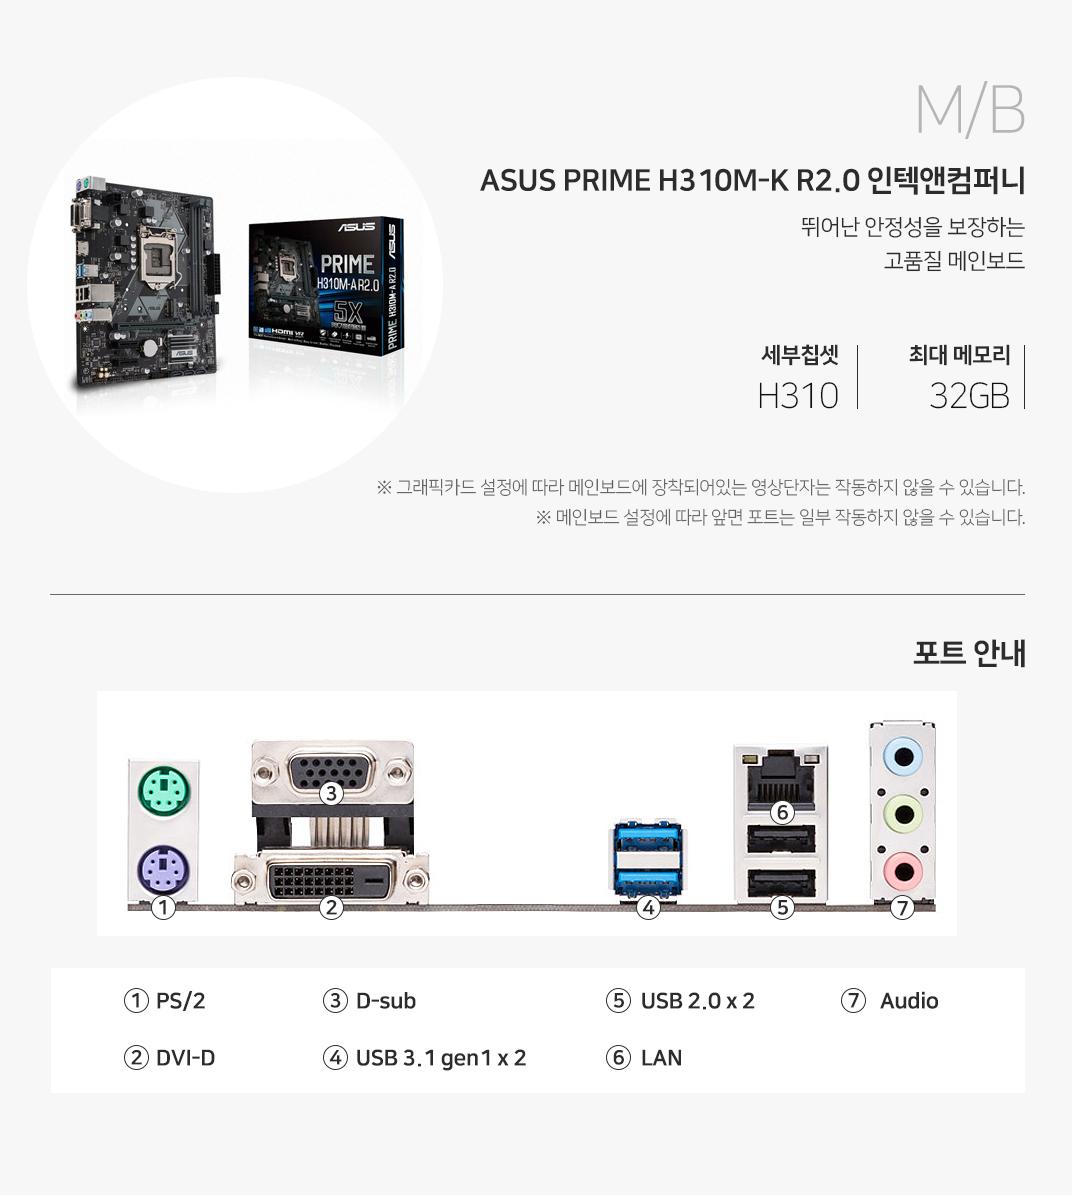 M/B ASUS PRIME H310M-K R2.0 인텍앤컴퍼니 뛰어난 안정성을 보장하는 고품질 메인보드 세부칩셋 H310 최대 메모리 32GB 그래픽 설정에 따라 메인보드에 장착되어 있는 영상단자는 작동하지 않을 수 있습니다. 메인보드 설정에 따라 앞면 포트는 일부 작동하지 않을 수 있습니다.